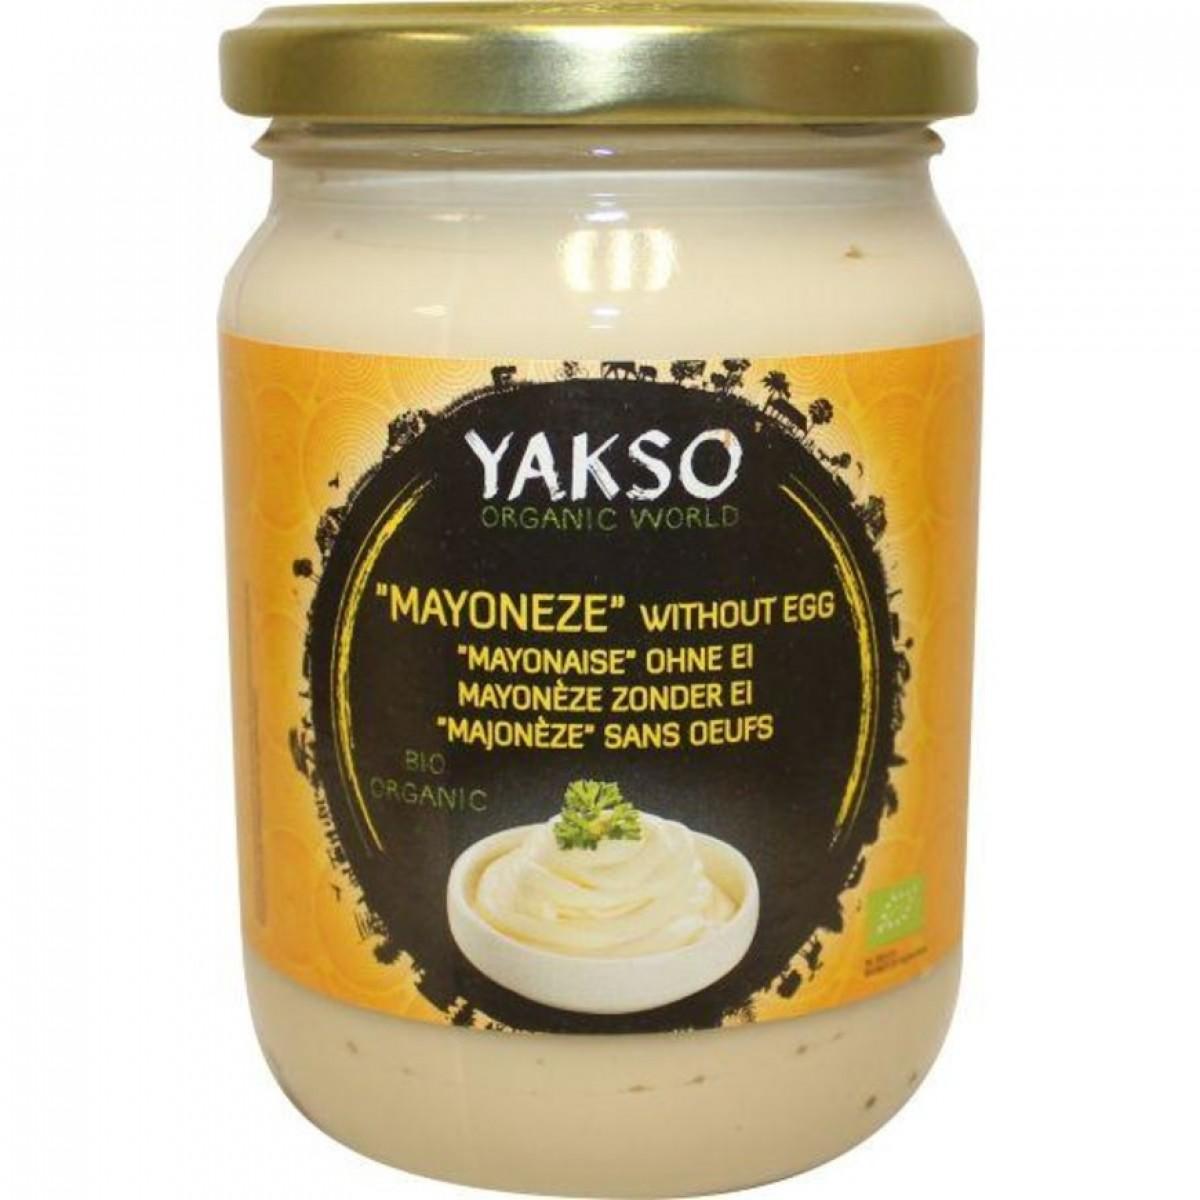 Mayonaise Zonder Ei